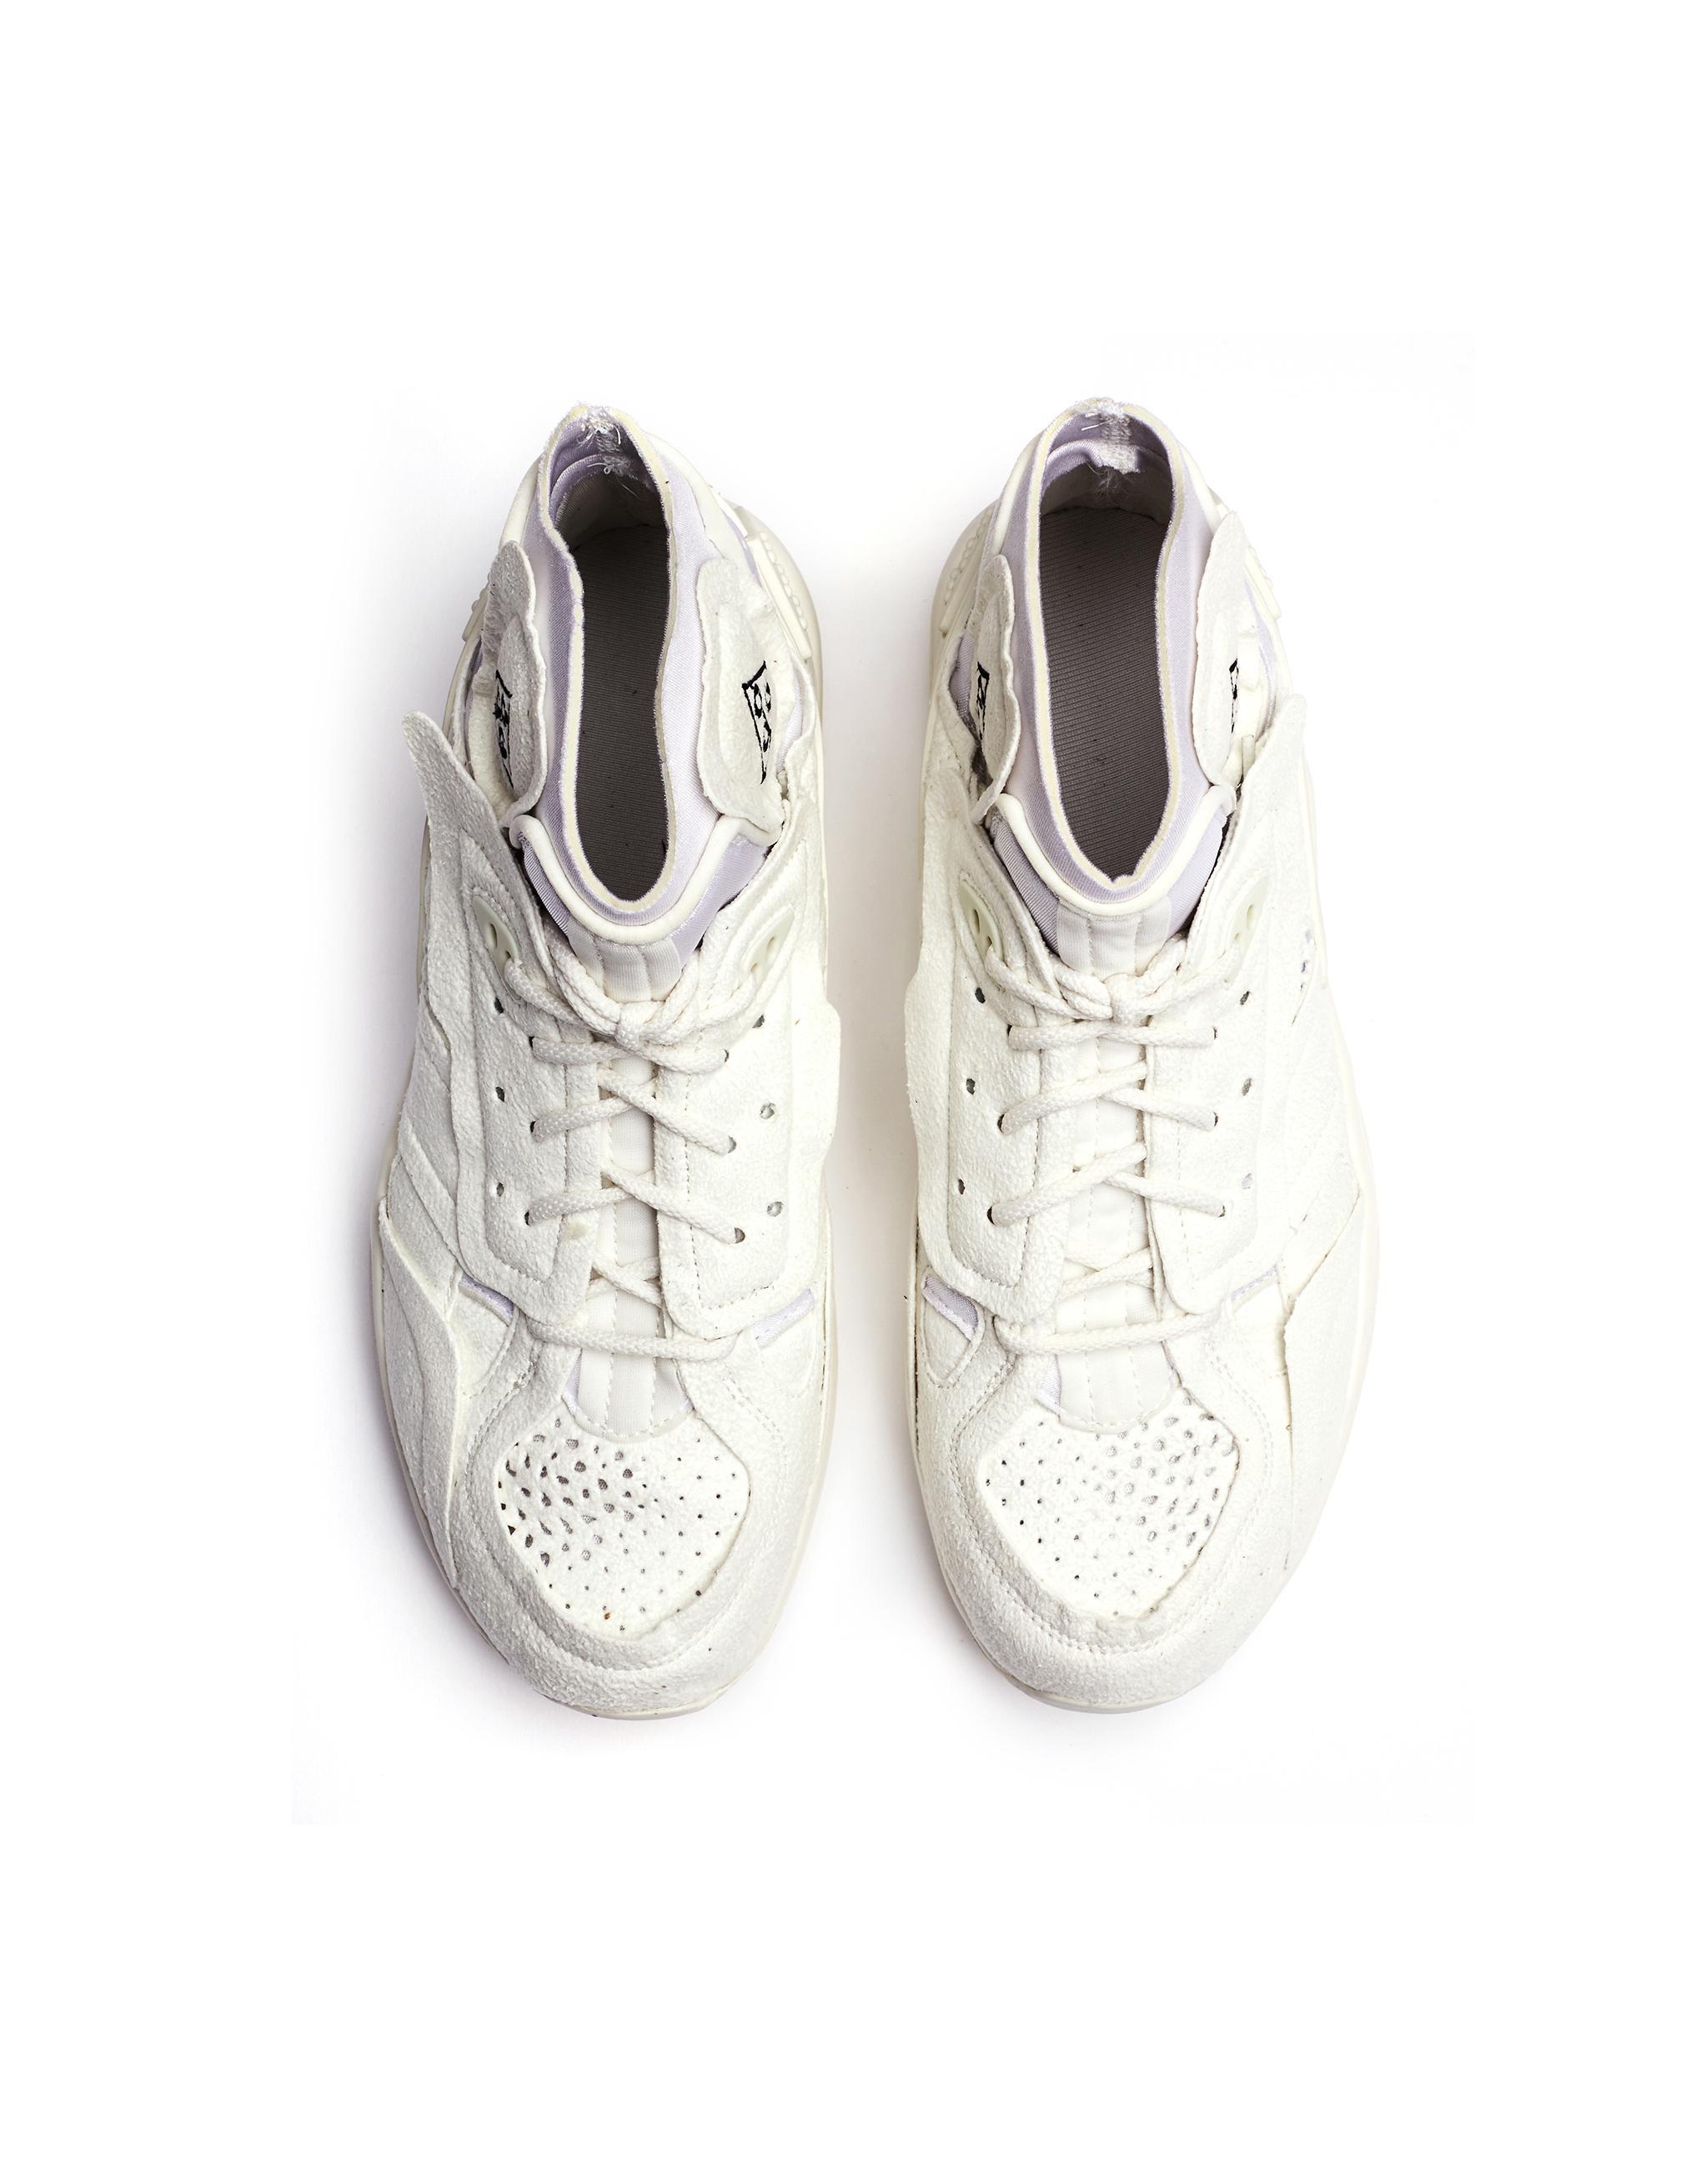 252bd130c8f5 Comme des Garçons White Nike Air Mowabb Sneakers in White - Lyst